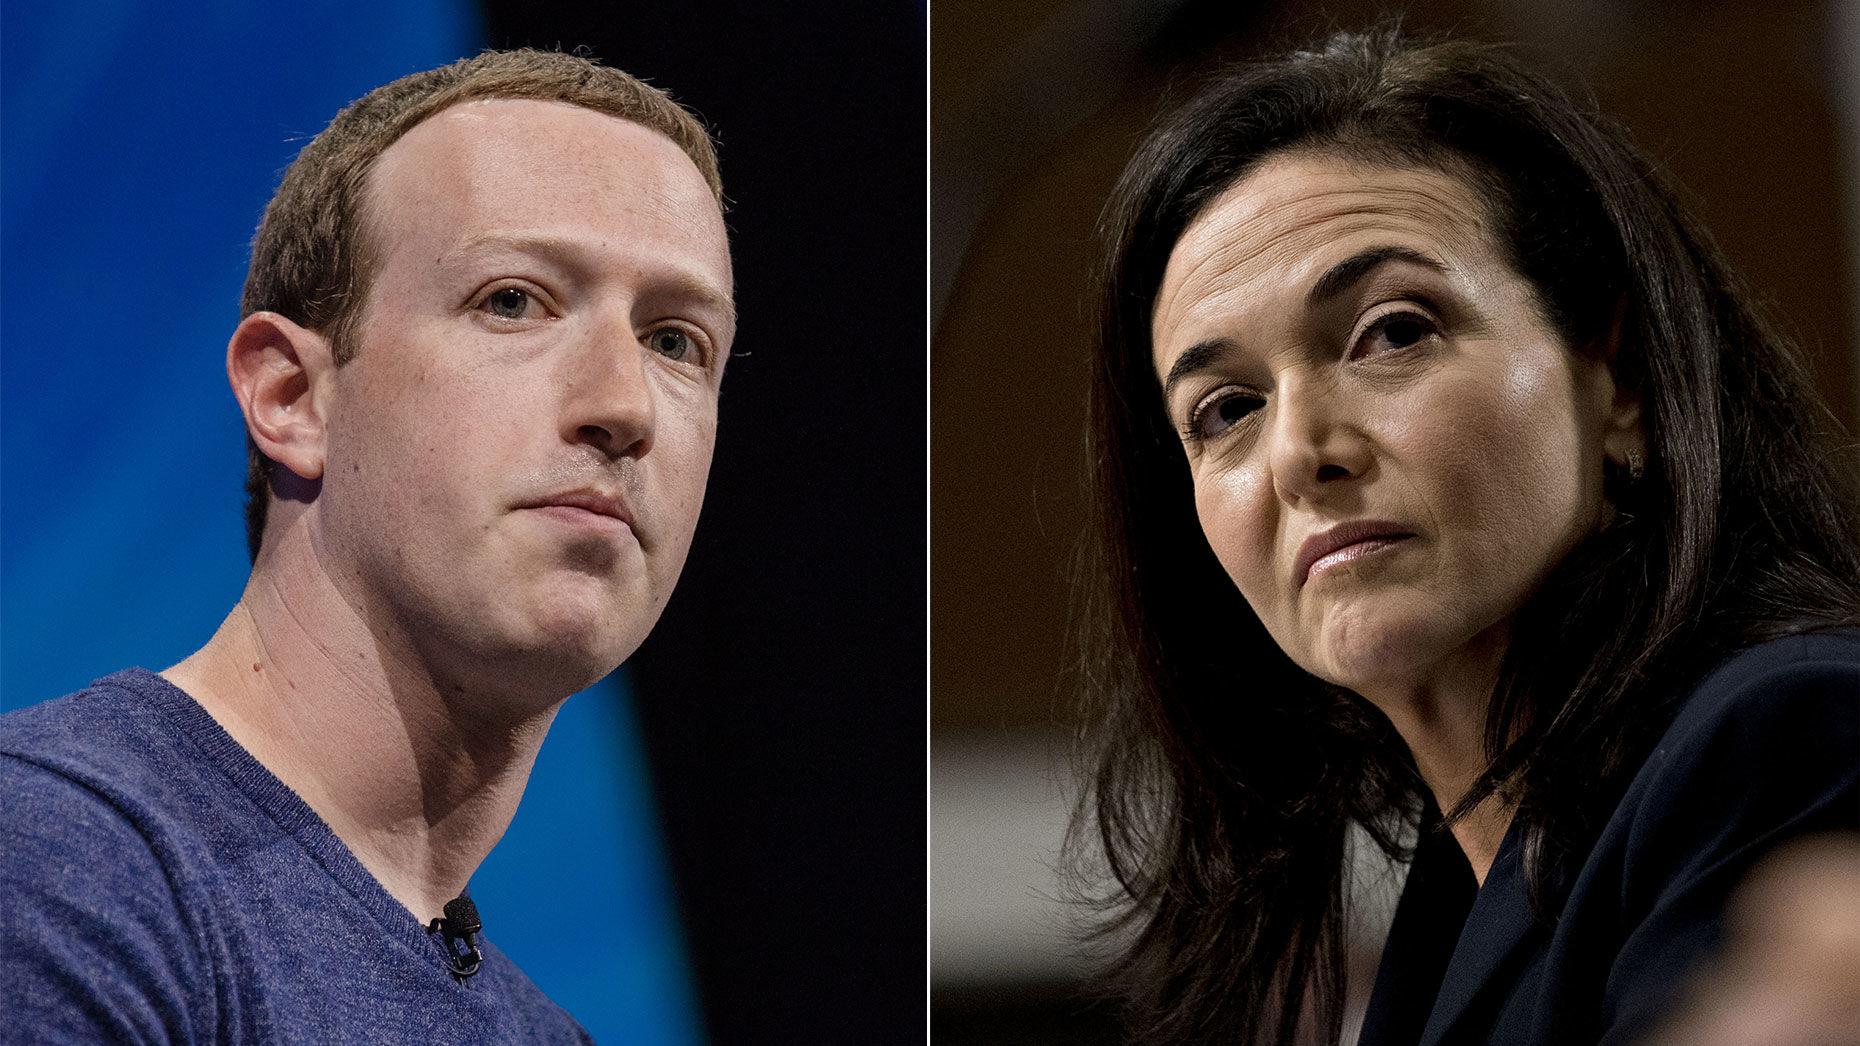 Mark Zuckerberg and Sheryl Sandberg. Photos by Bloomberg